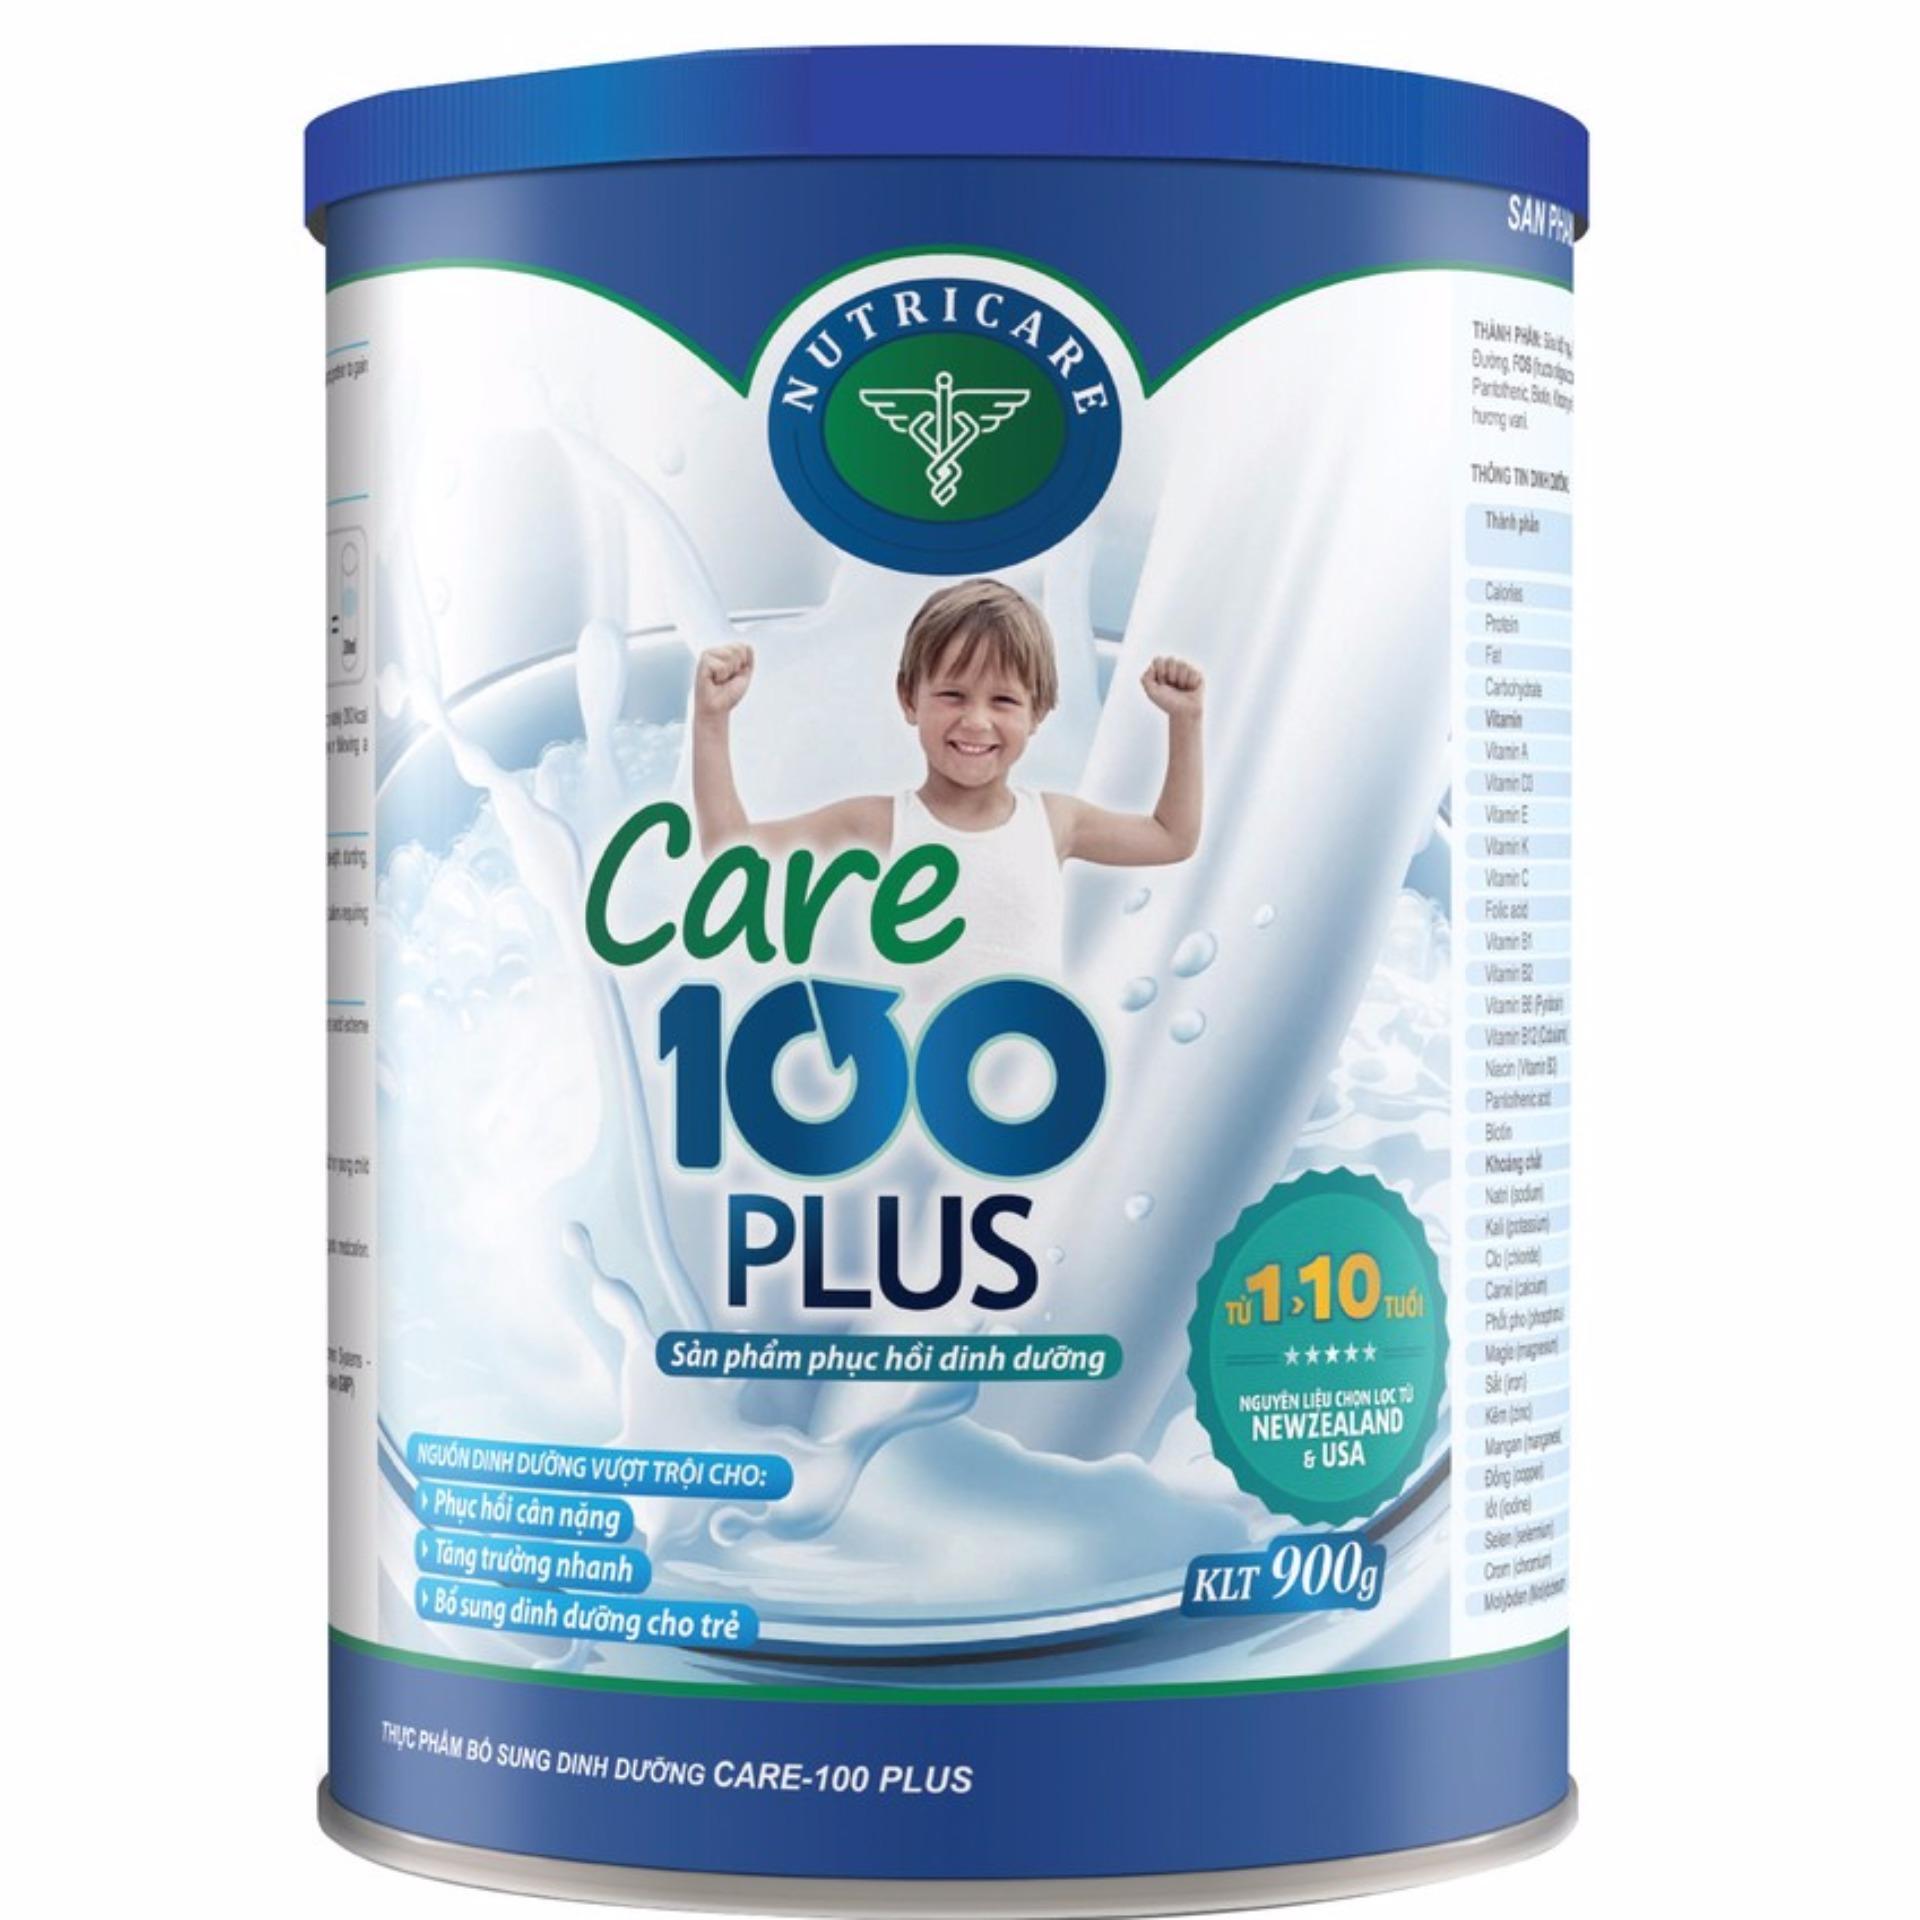 Sữa cho bé Nutricare Care 100 Plus 900g(500ml - 1 lít)